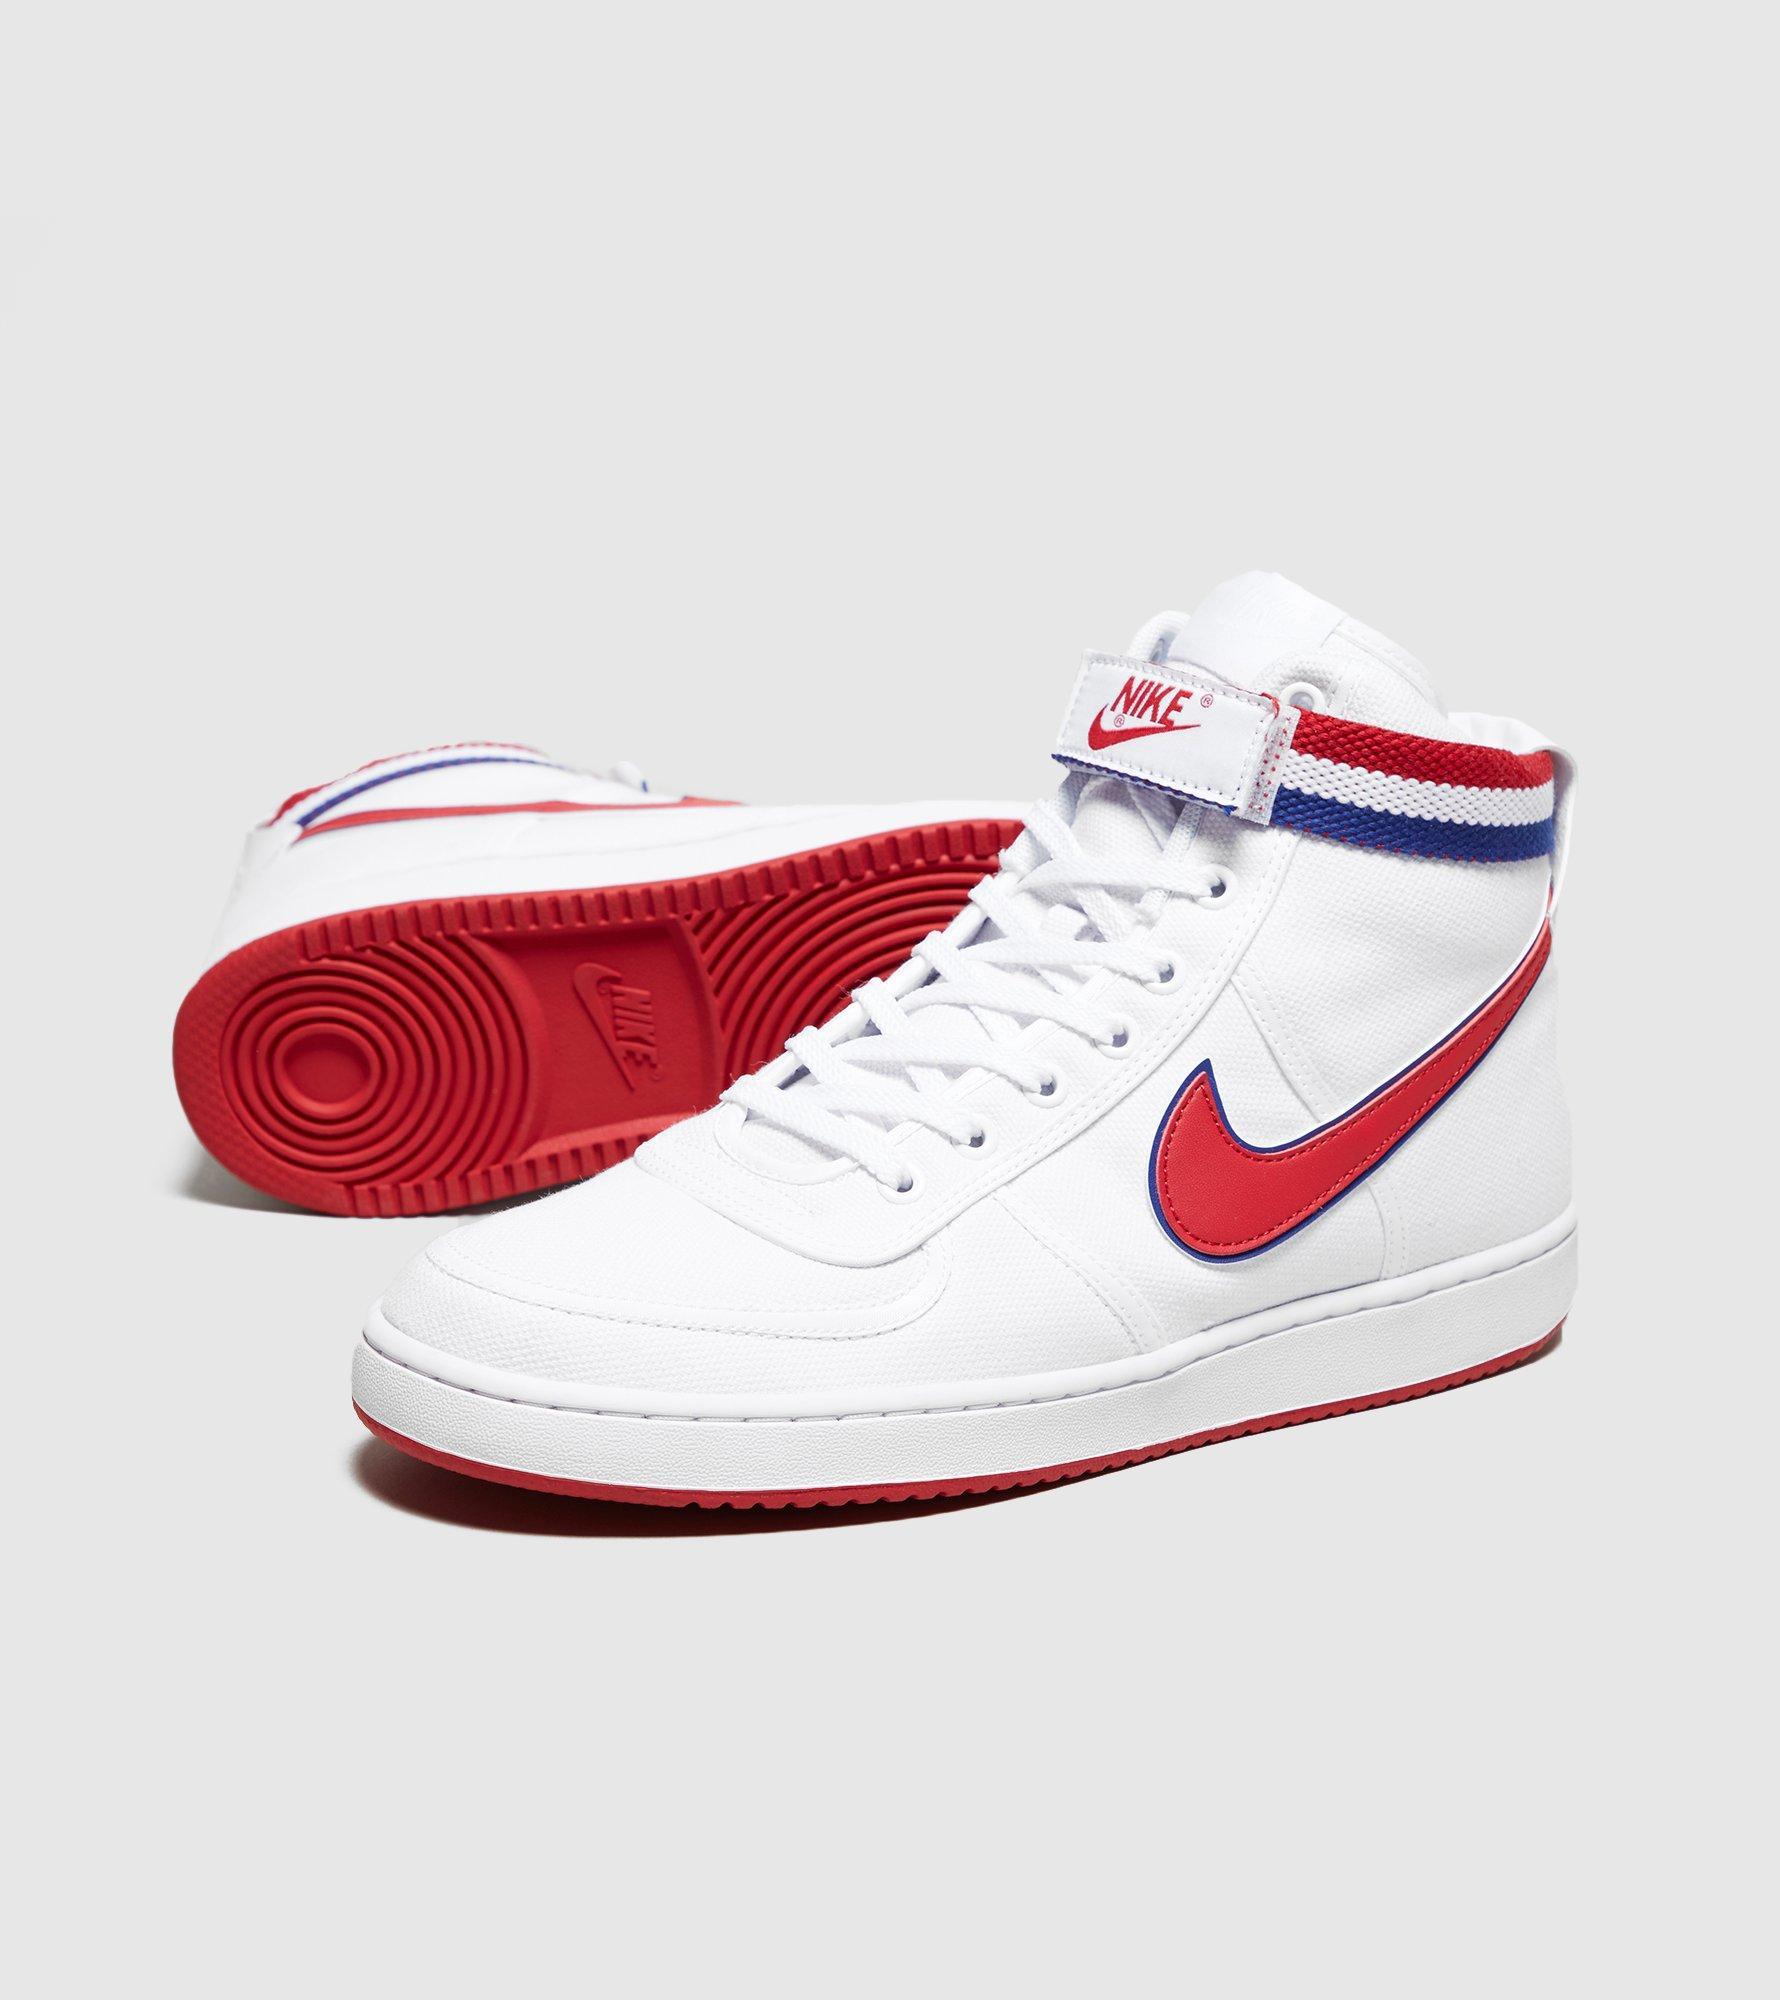 34f24ffdad28 Lyst - Nike Vandal High Supreme in White for Men